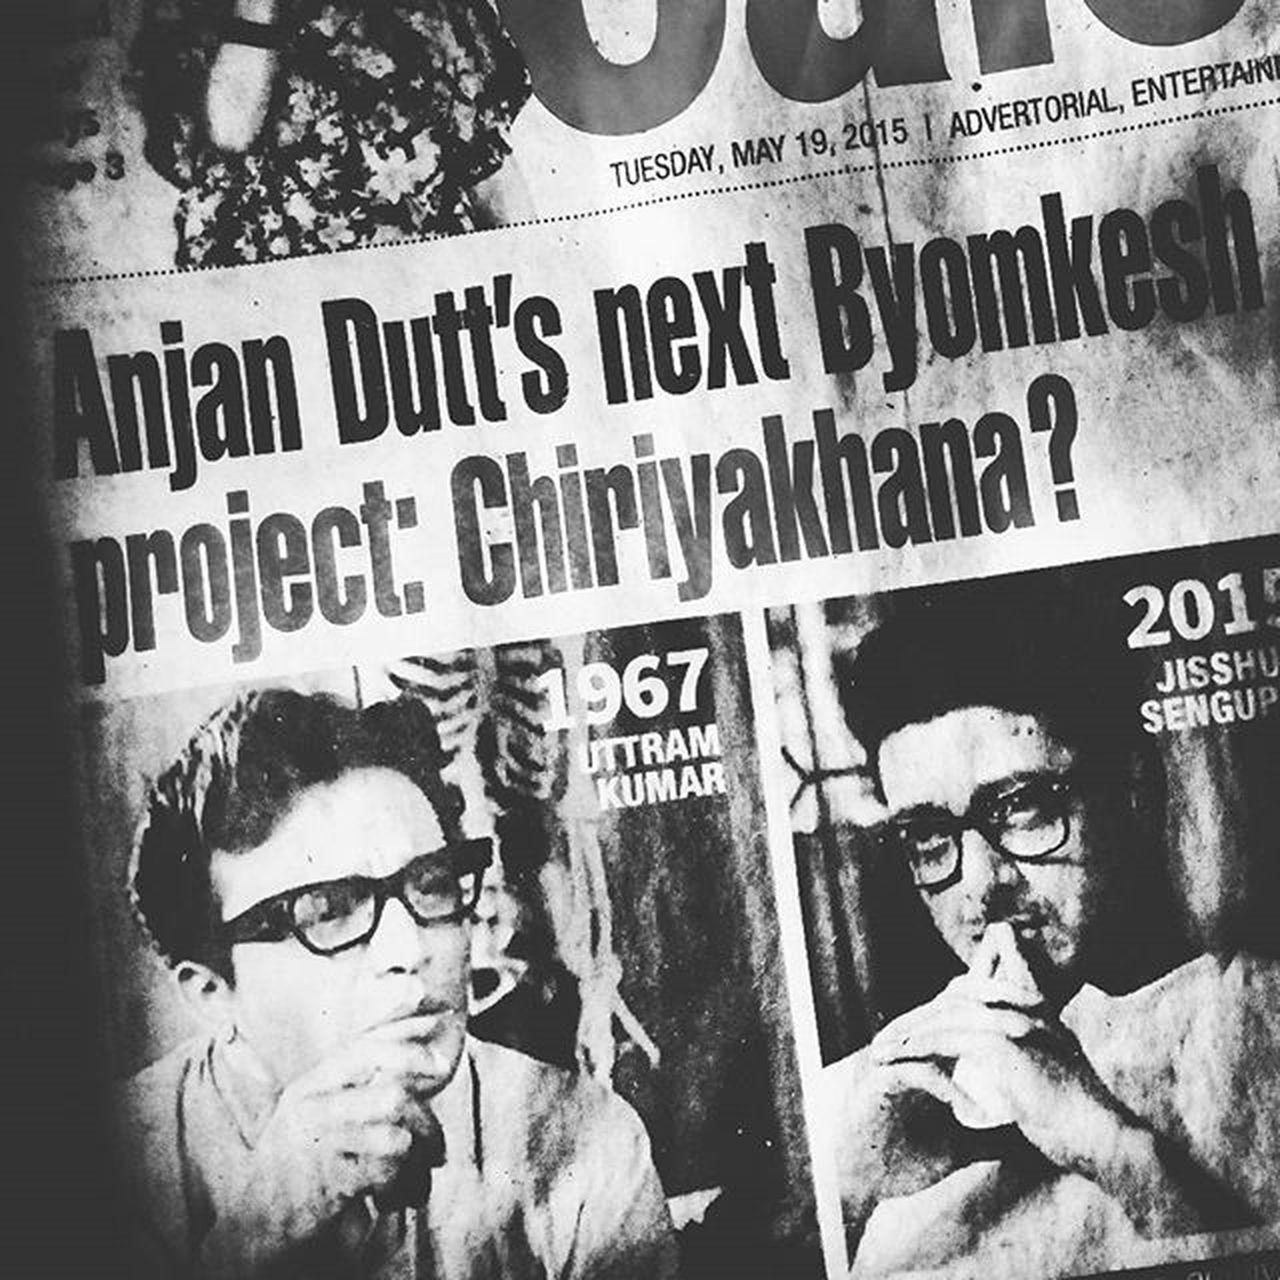 Calcuttatimes Newspapershot Bw Uttamkumar Jishusengupta Byomkeshbakshi Film Anjandutta